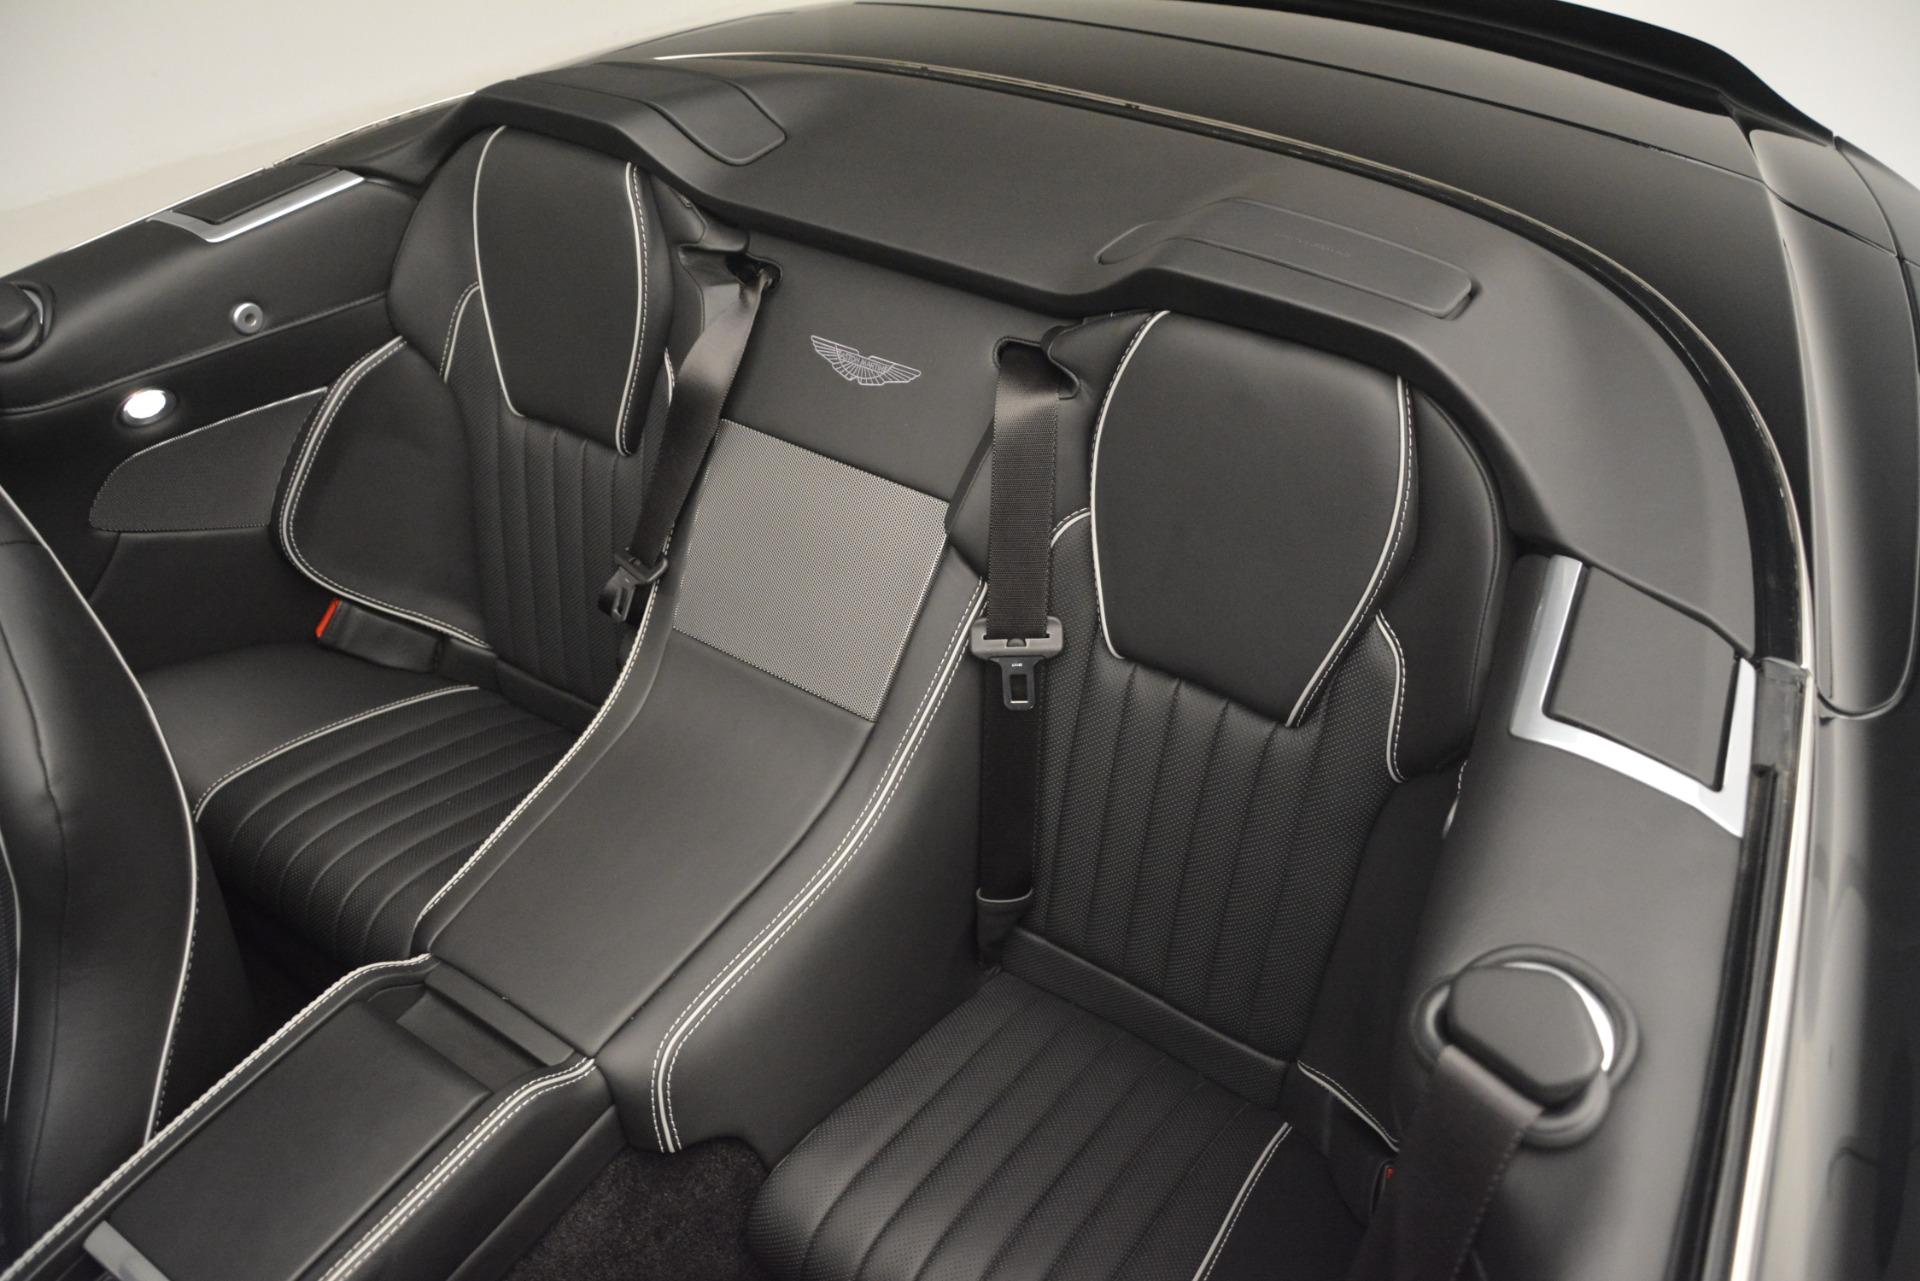 Used 2016 Aston Martin DB9 Convertible For Sale In Greenwich, CT. Alfa Romeo of Greenwich, 7495 2971_p18